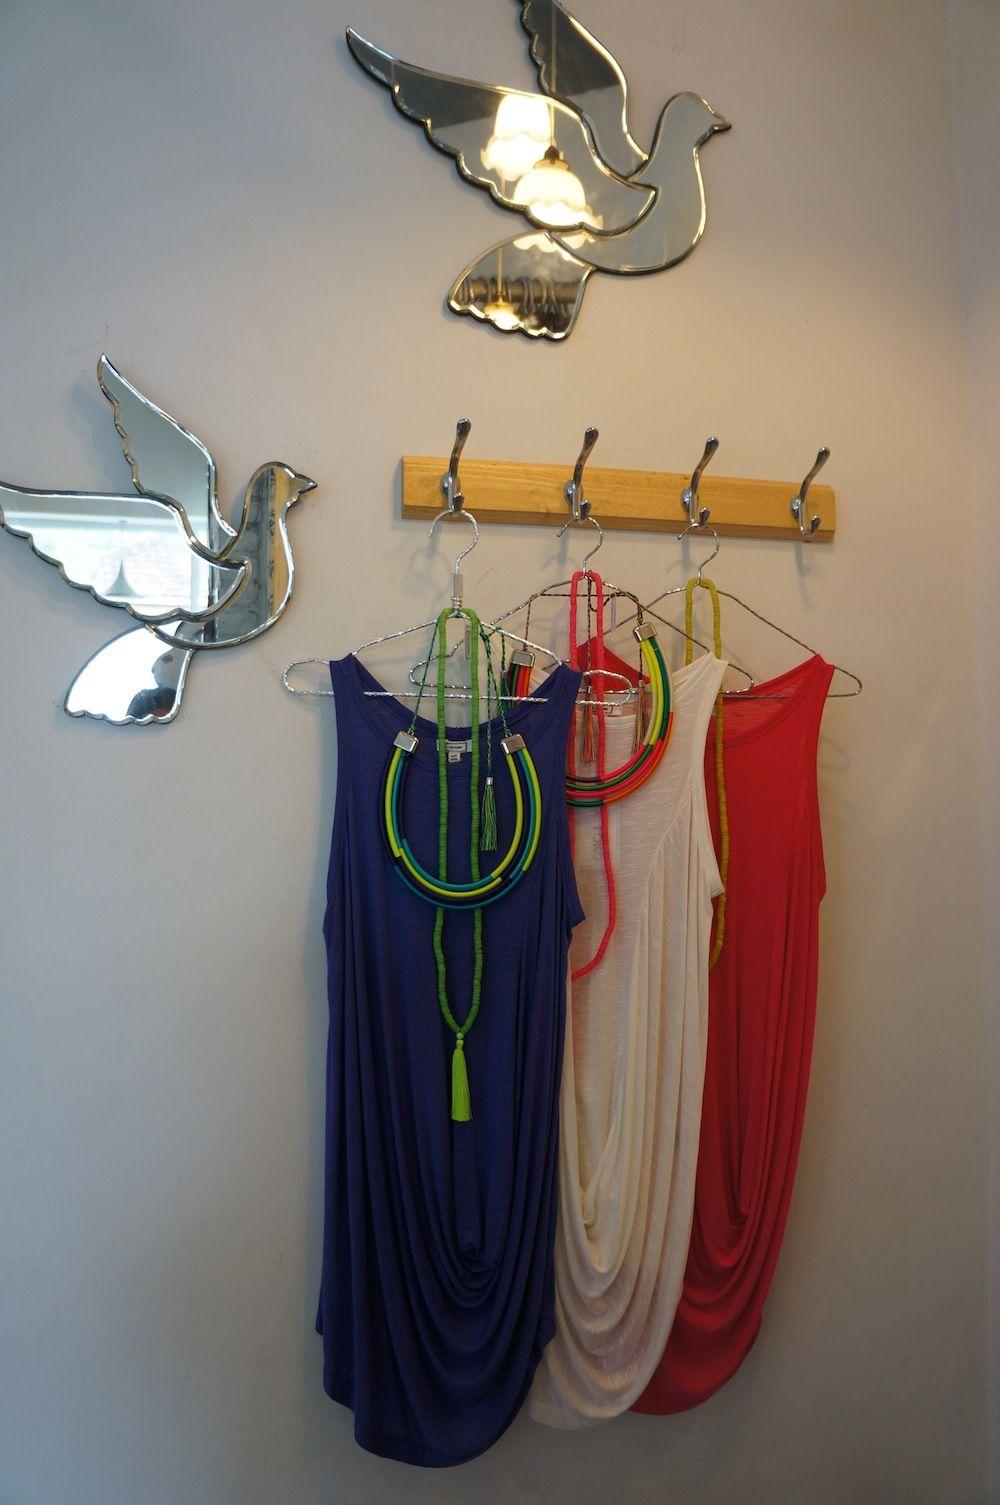 Summer dresses #comfortable #drape #colors #neon #necklaces #mirrorbirds #bali #conceptstore #letoko